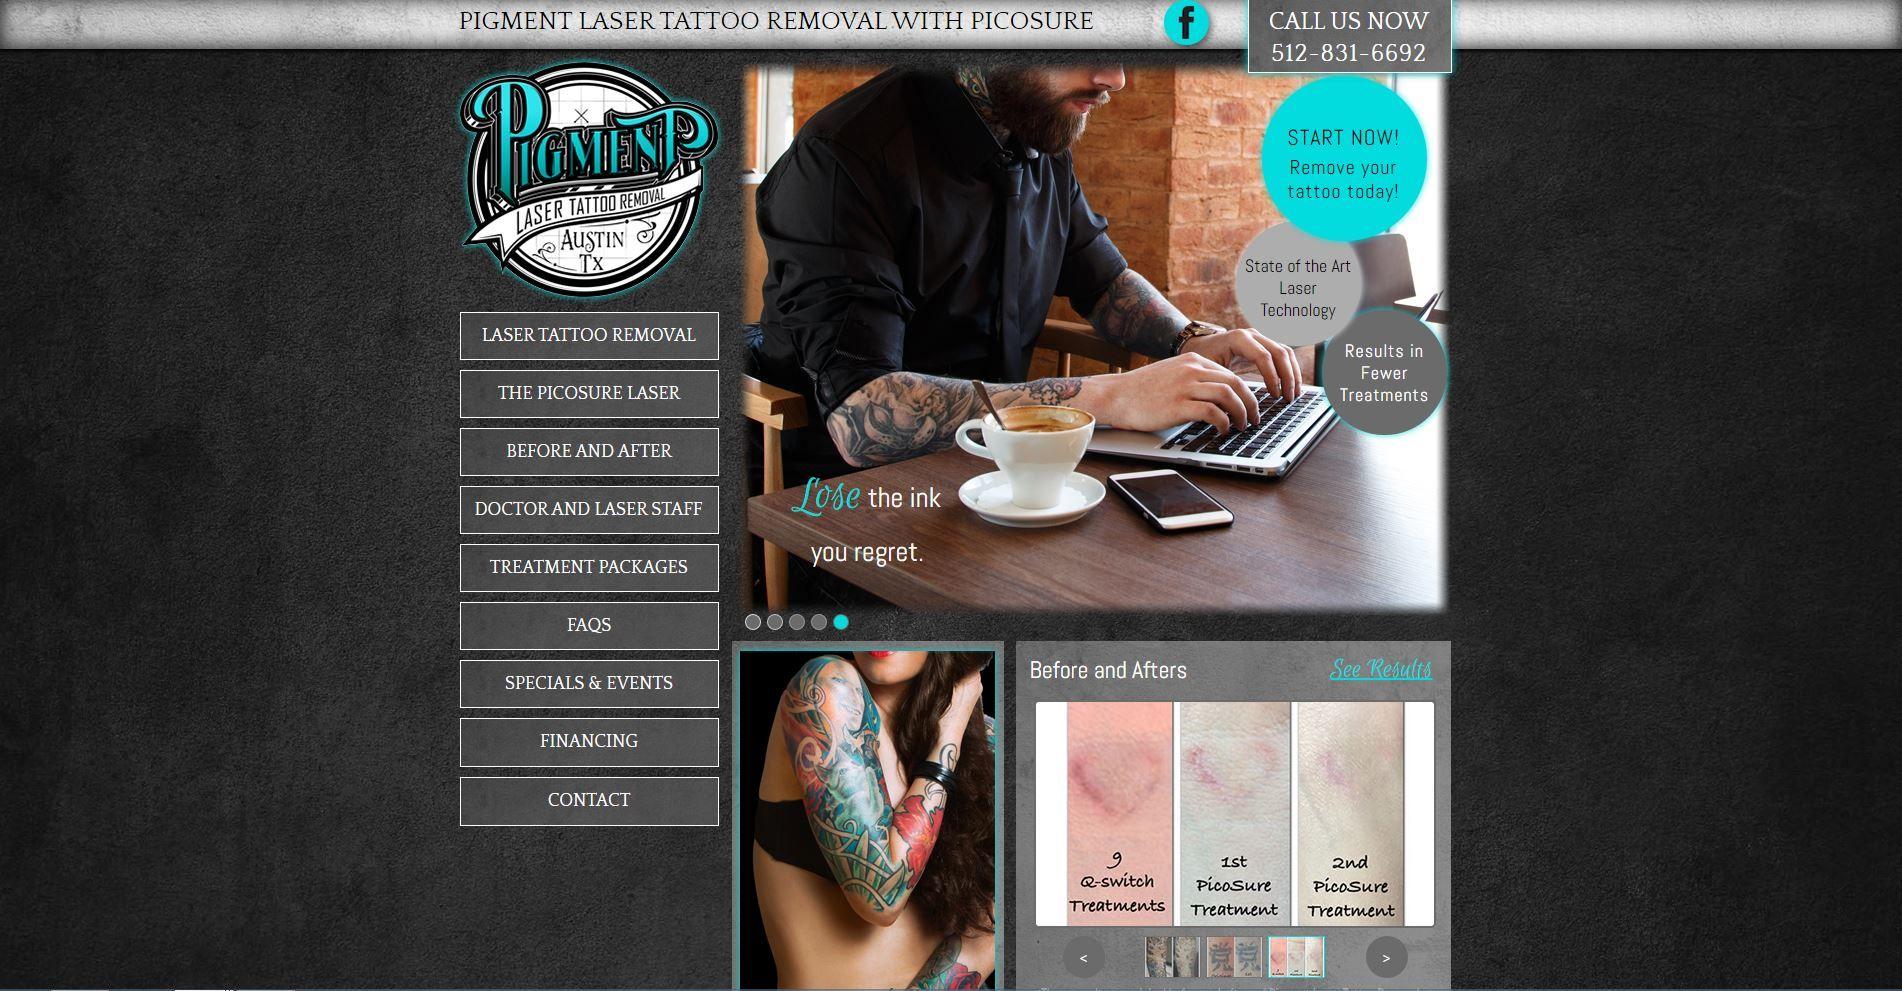 Pigment laser tattoo removal docweb designs http